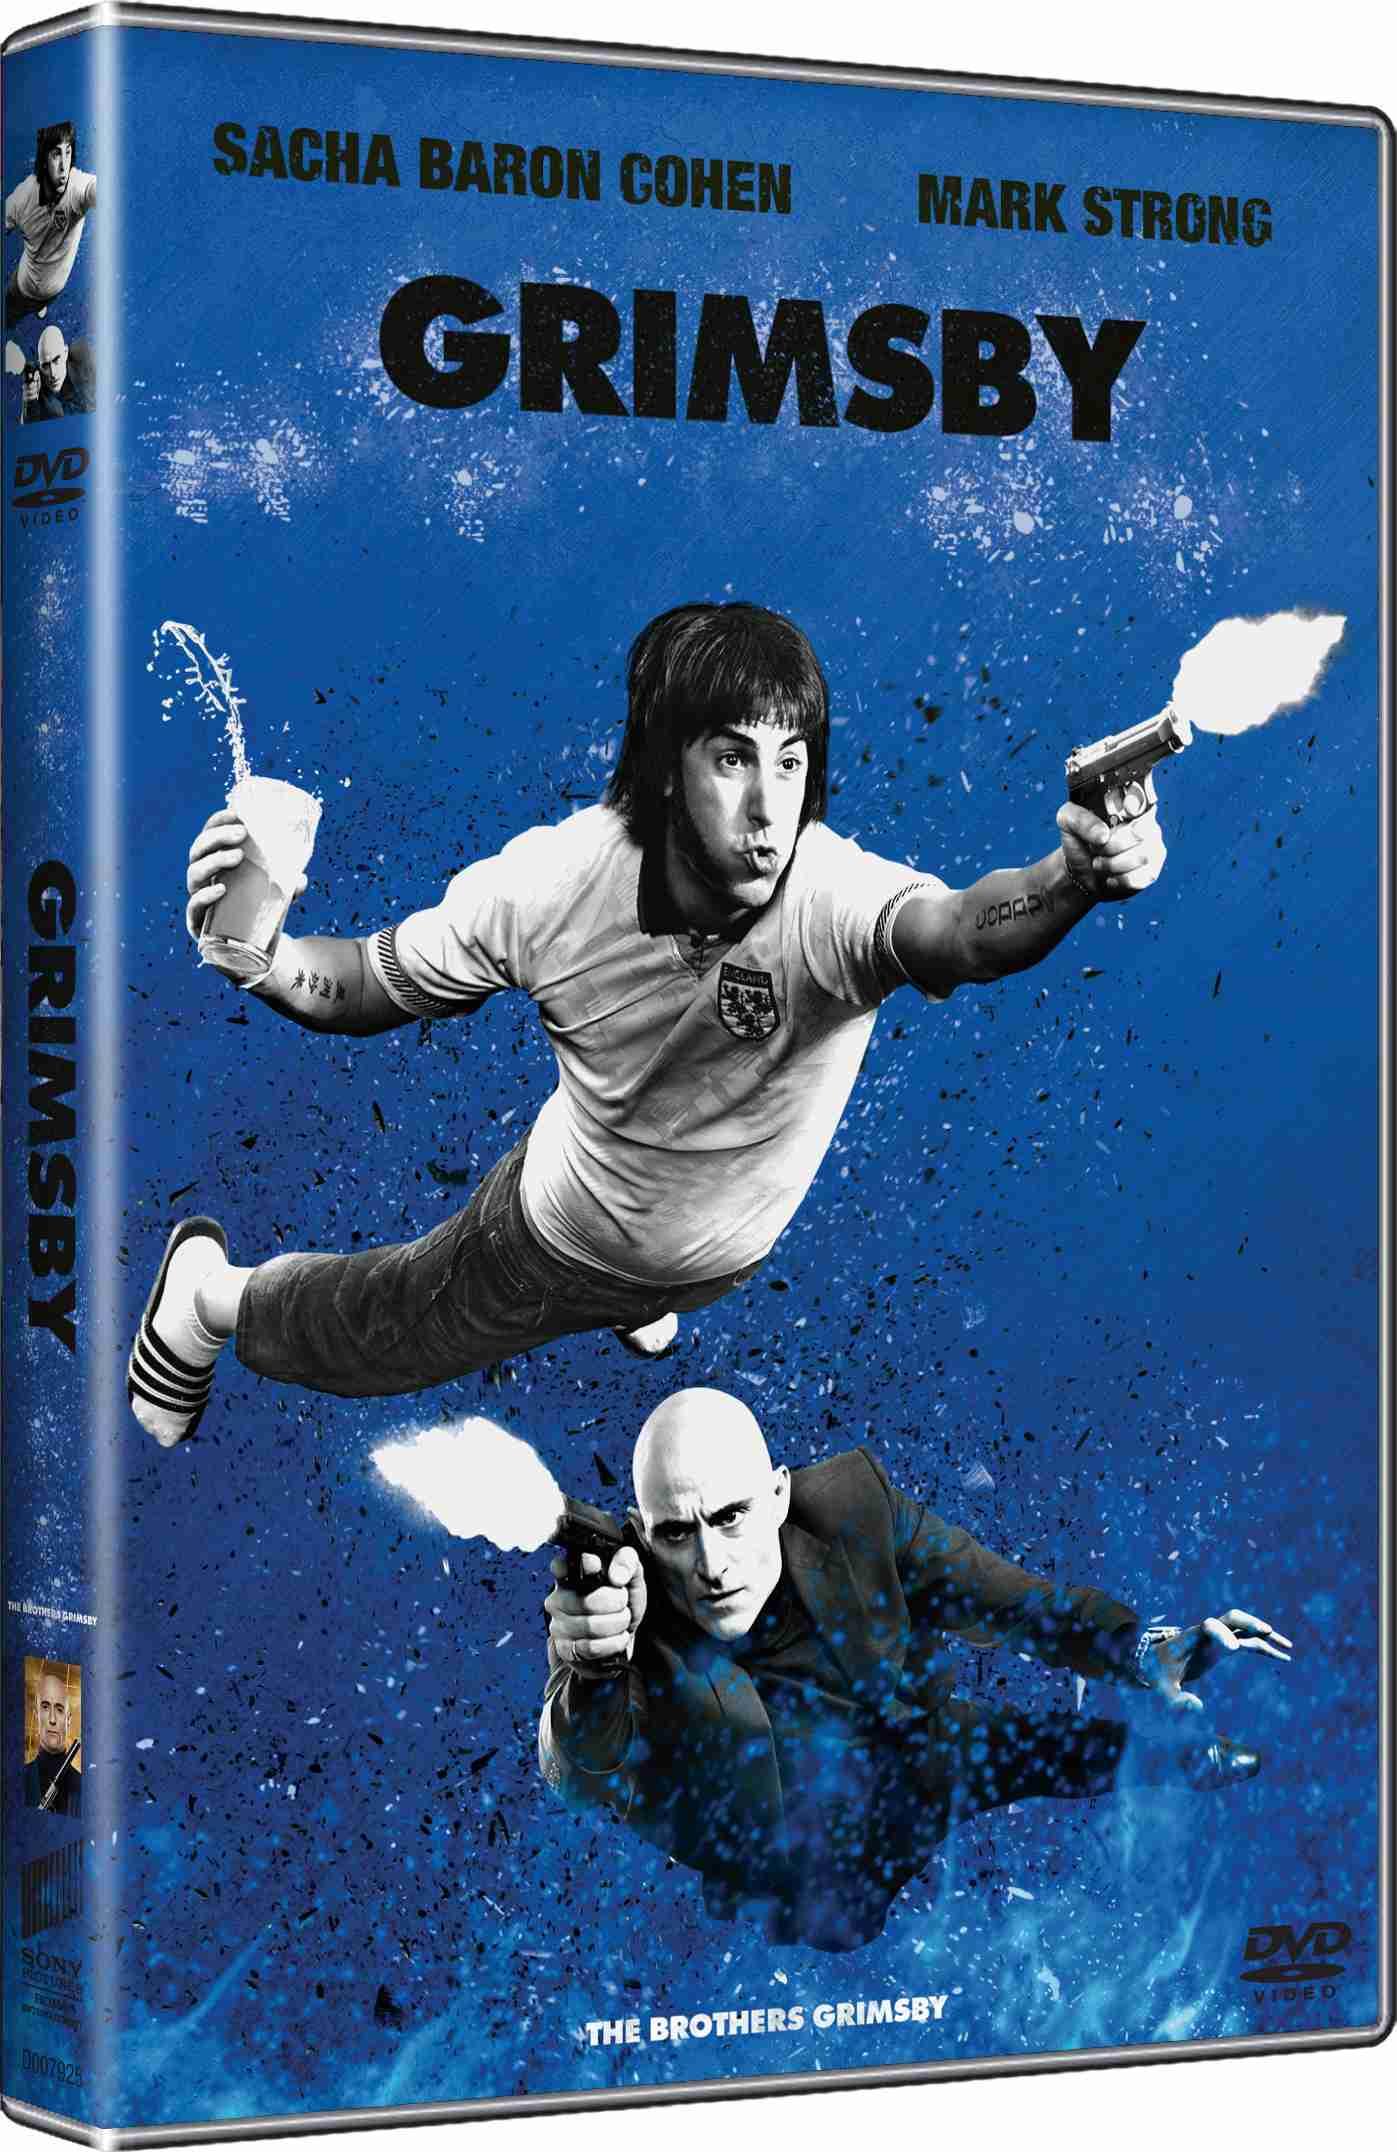 GRIMSBY (Big Face) - DVD